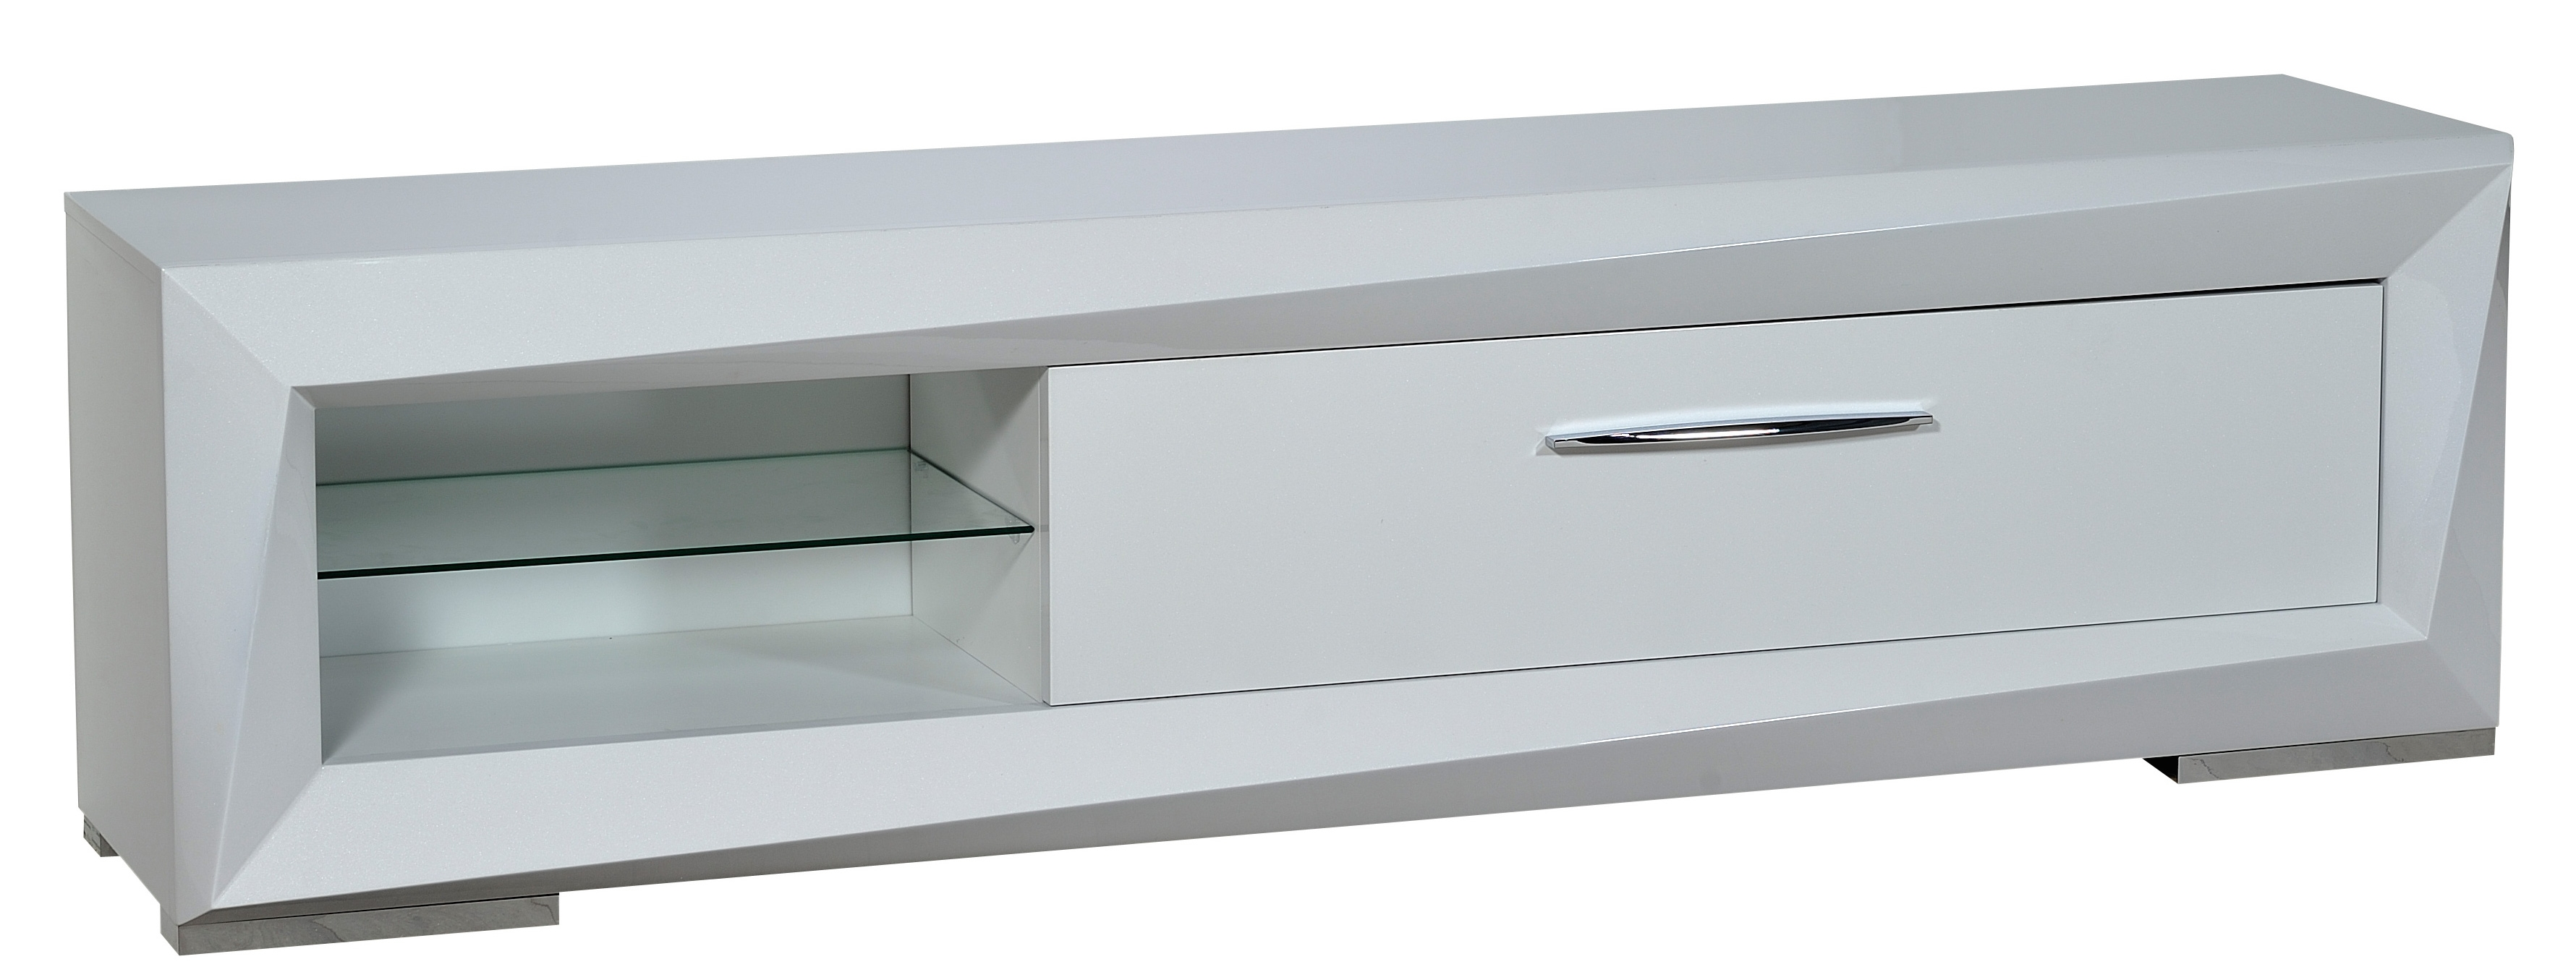 meuble tv 1 tiroir blanc laqu must. Black Bedroom Furniture Sets. Home Design Ideas